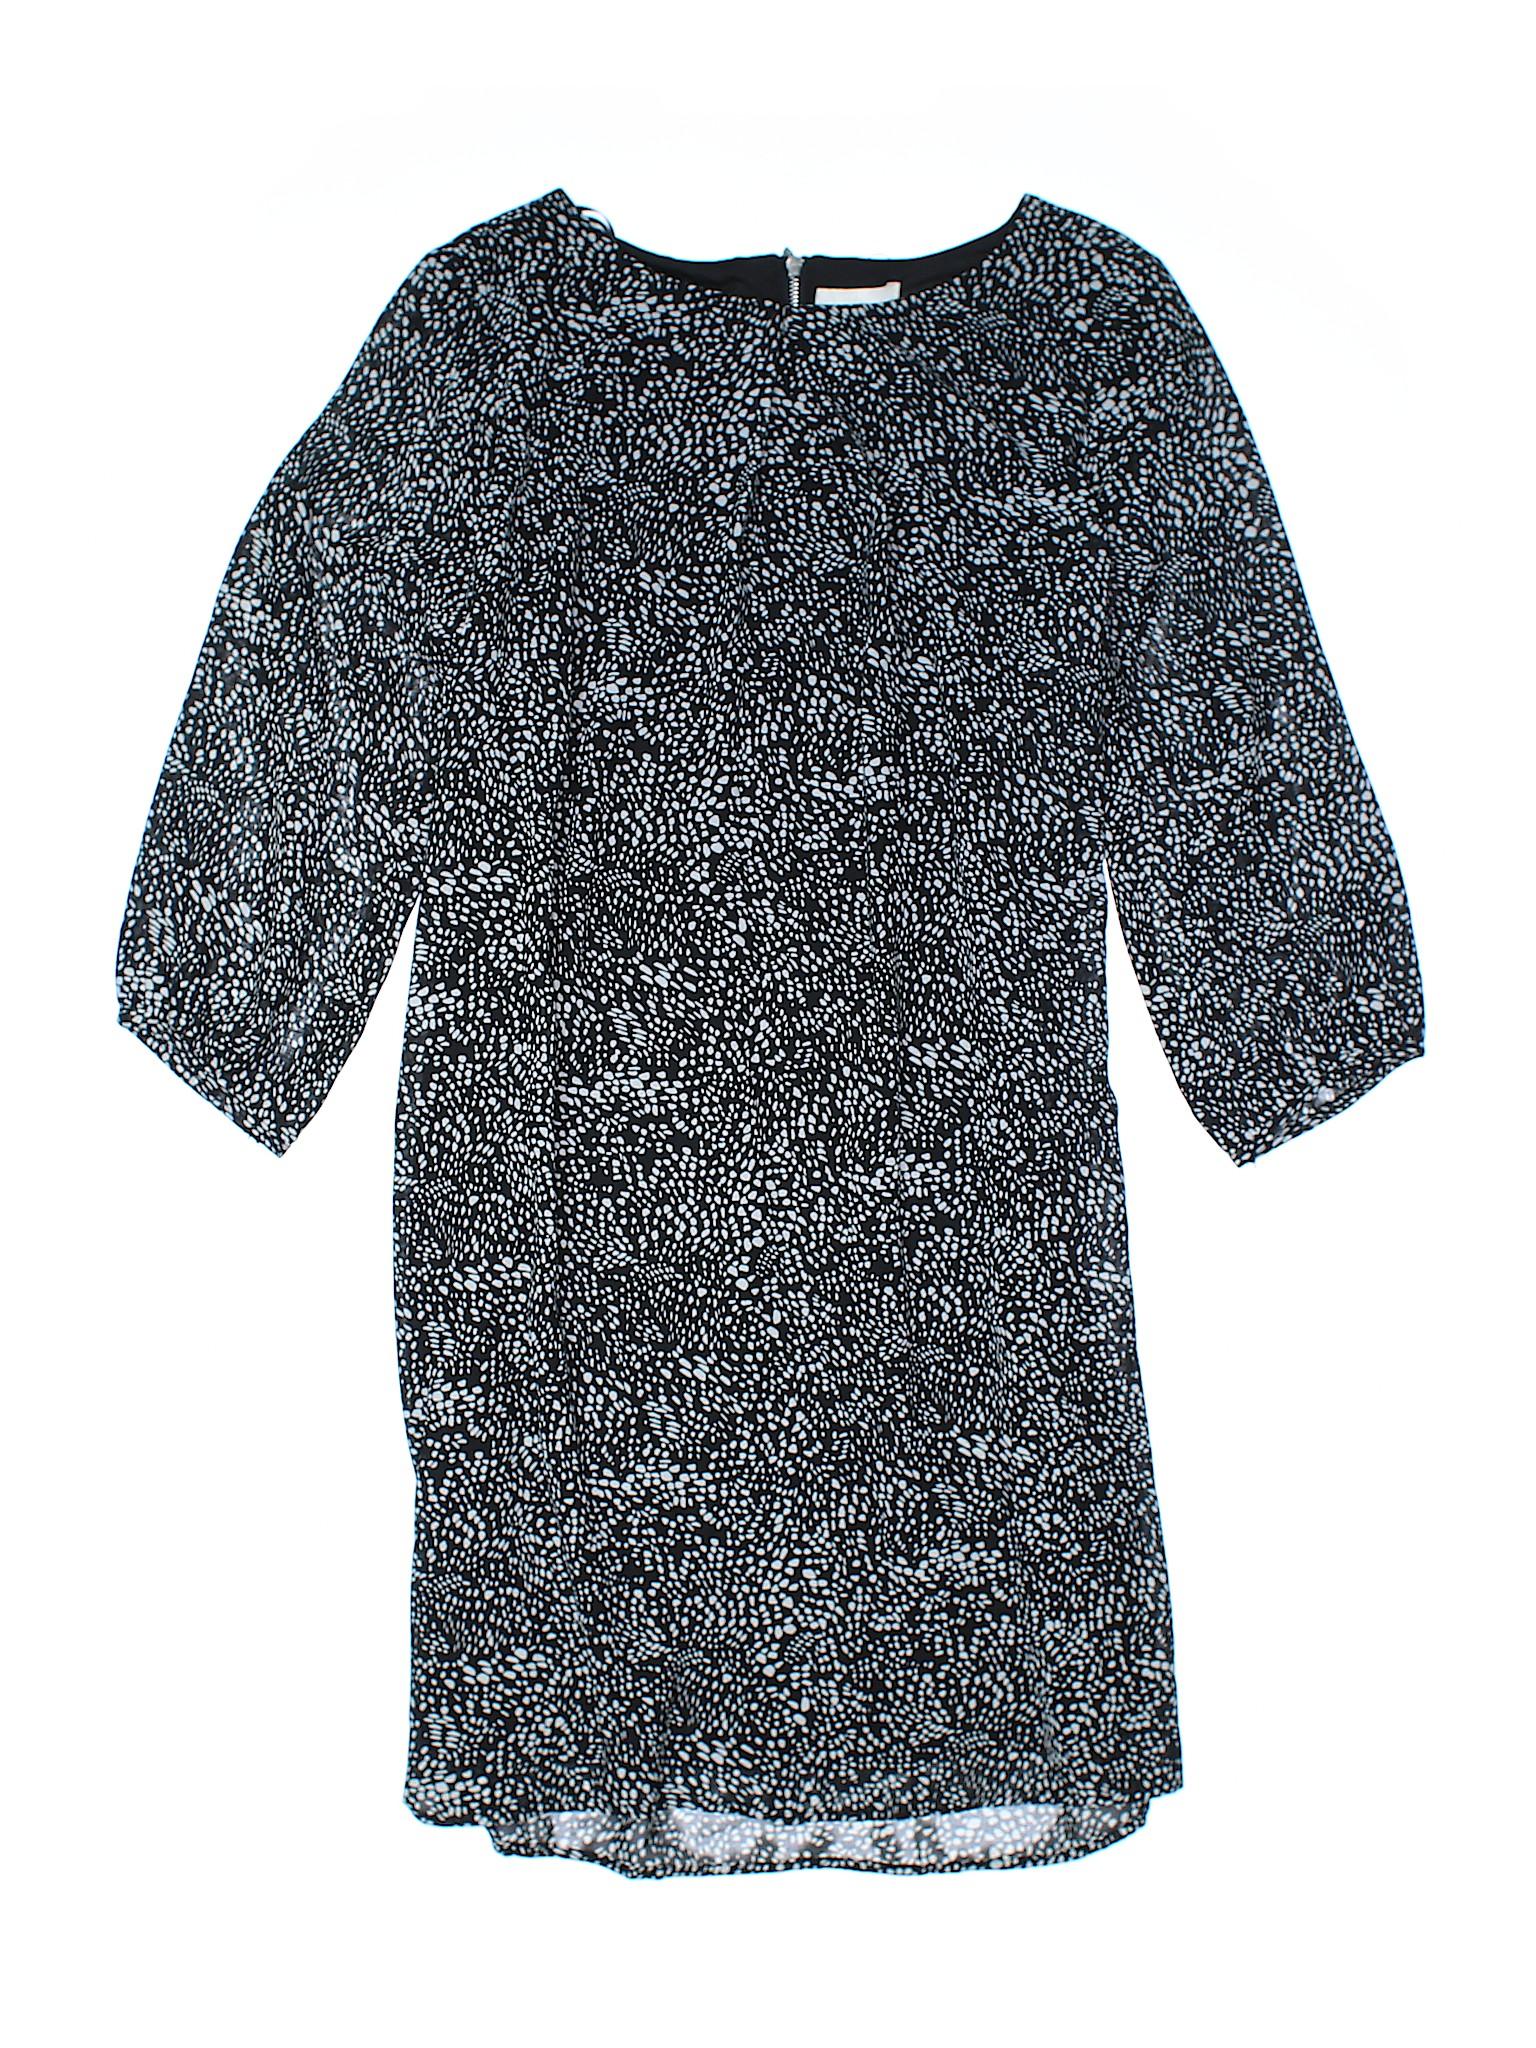 Dress winter amp;M H Casual Boutique WYx7PwTx